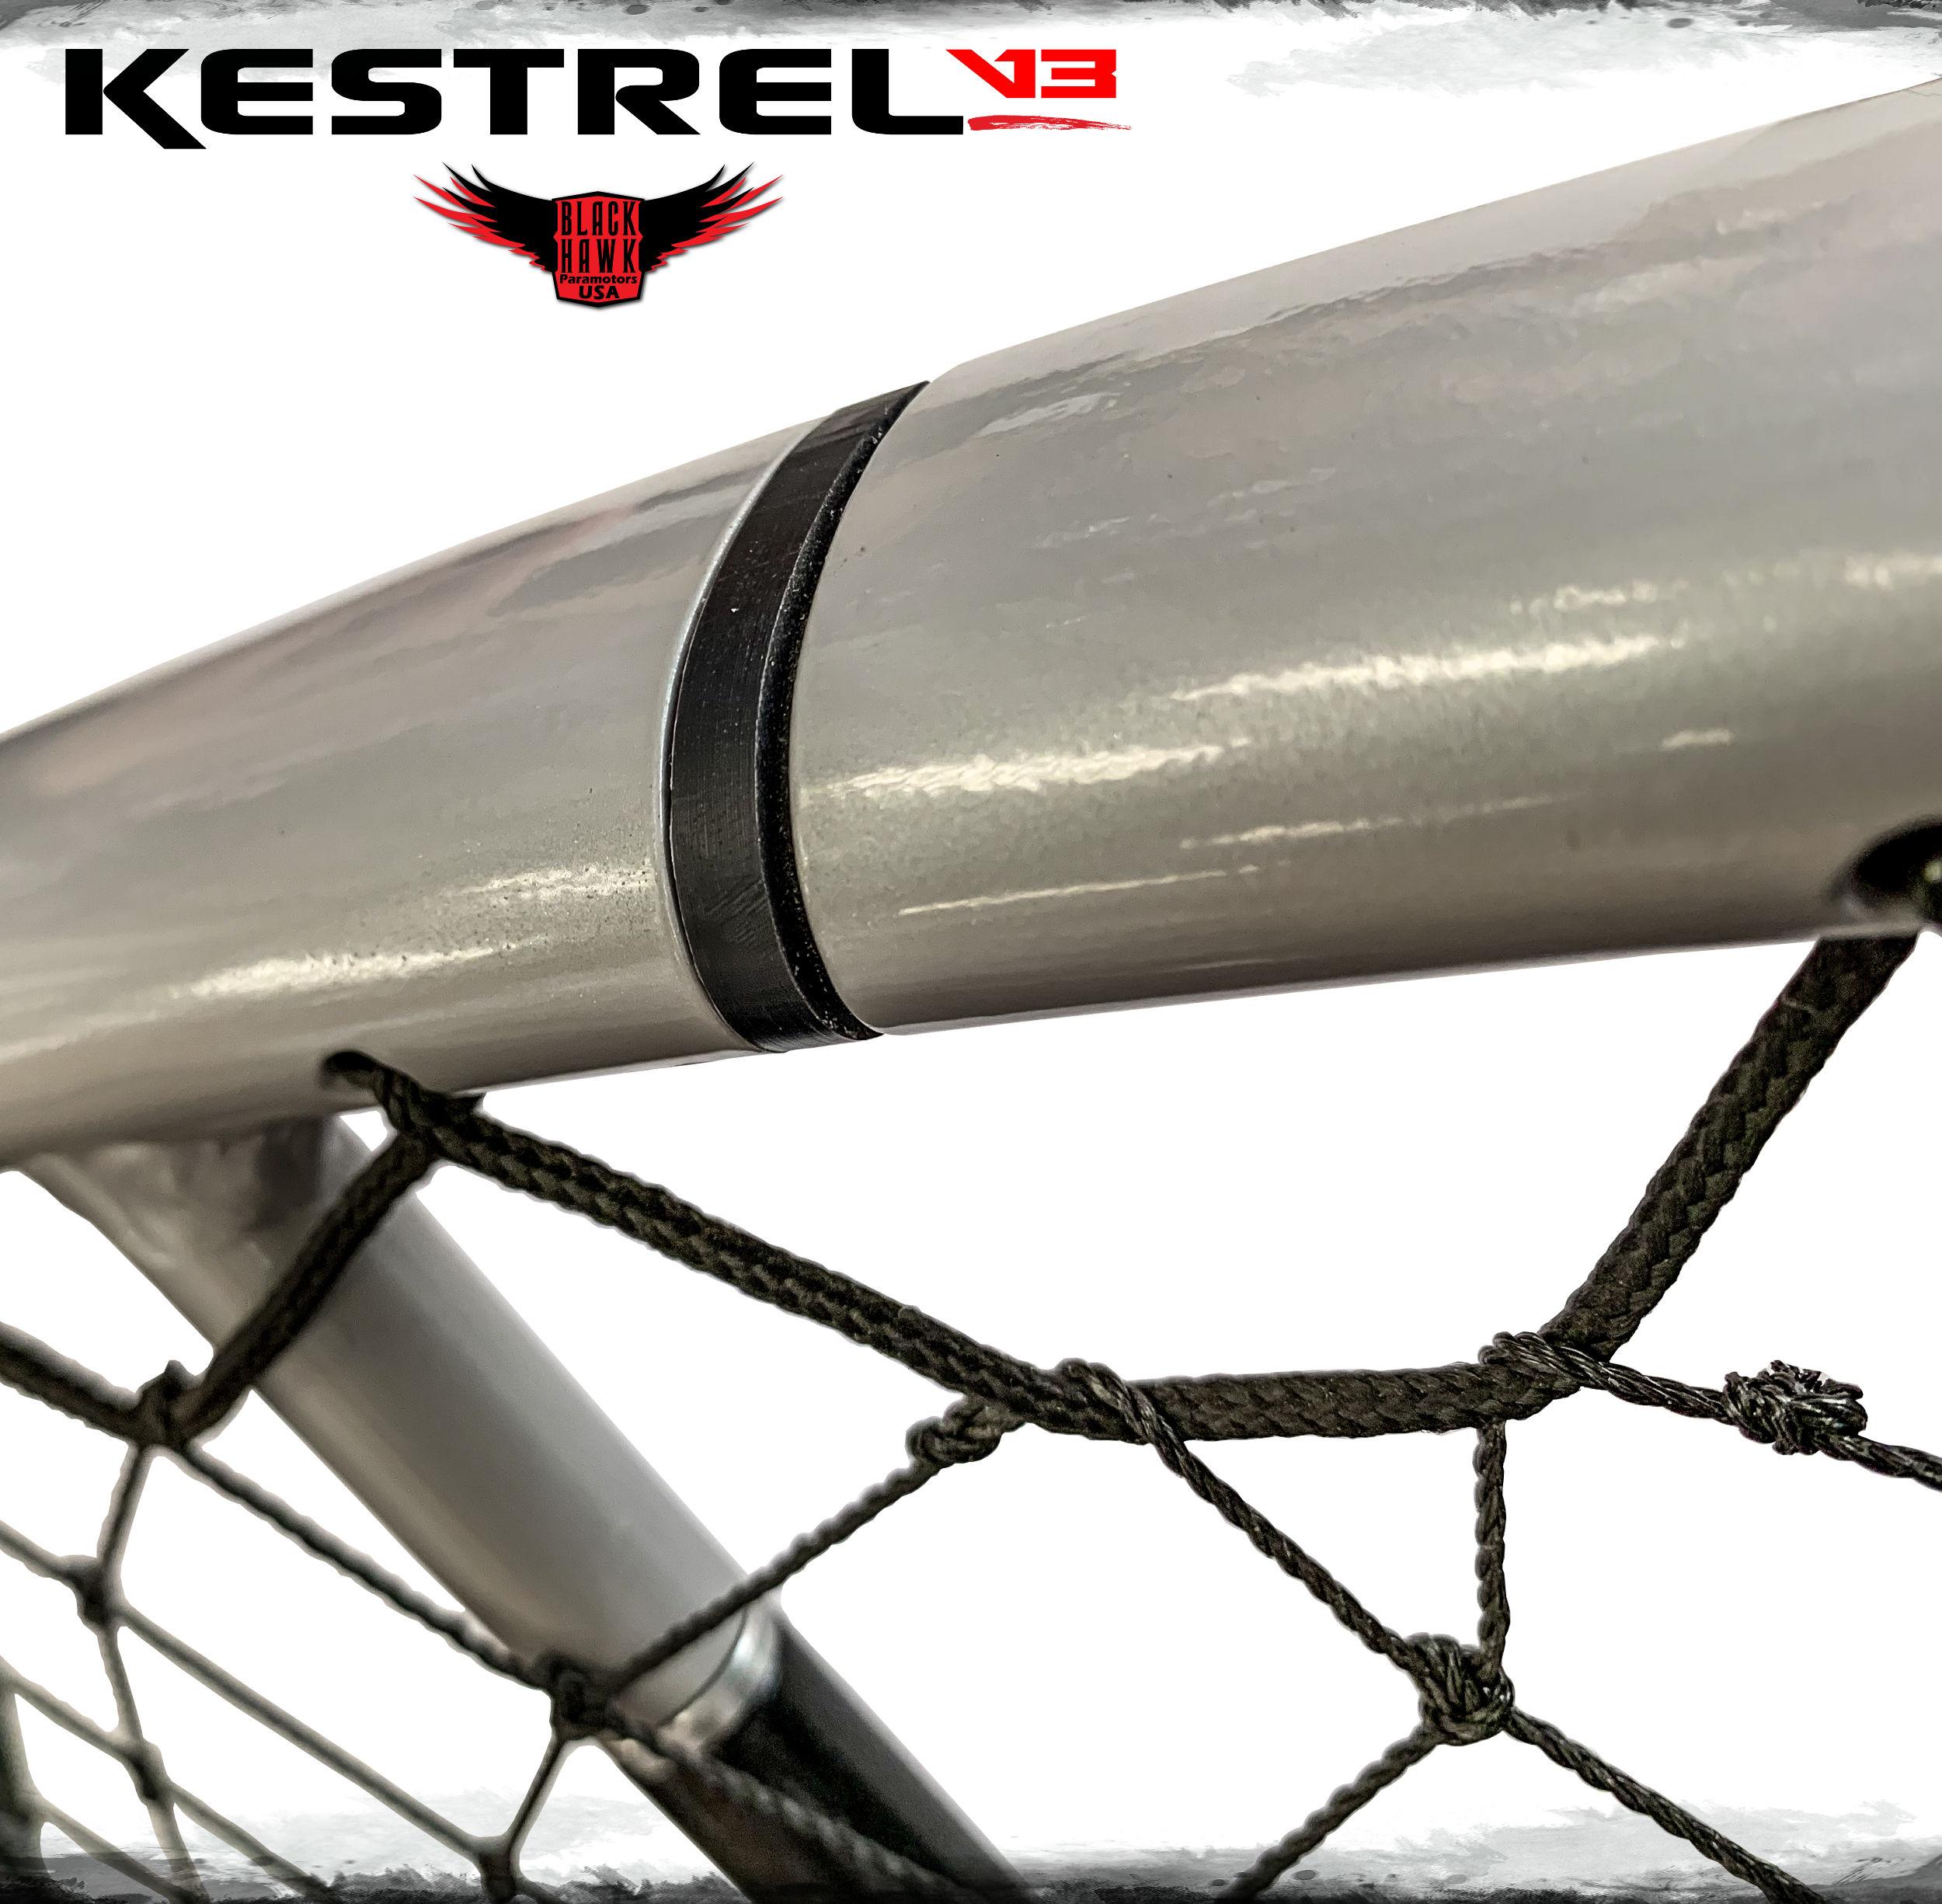 BlackHawk Paramotor Kestrel V3 Paramotor Frame 2019 (13